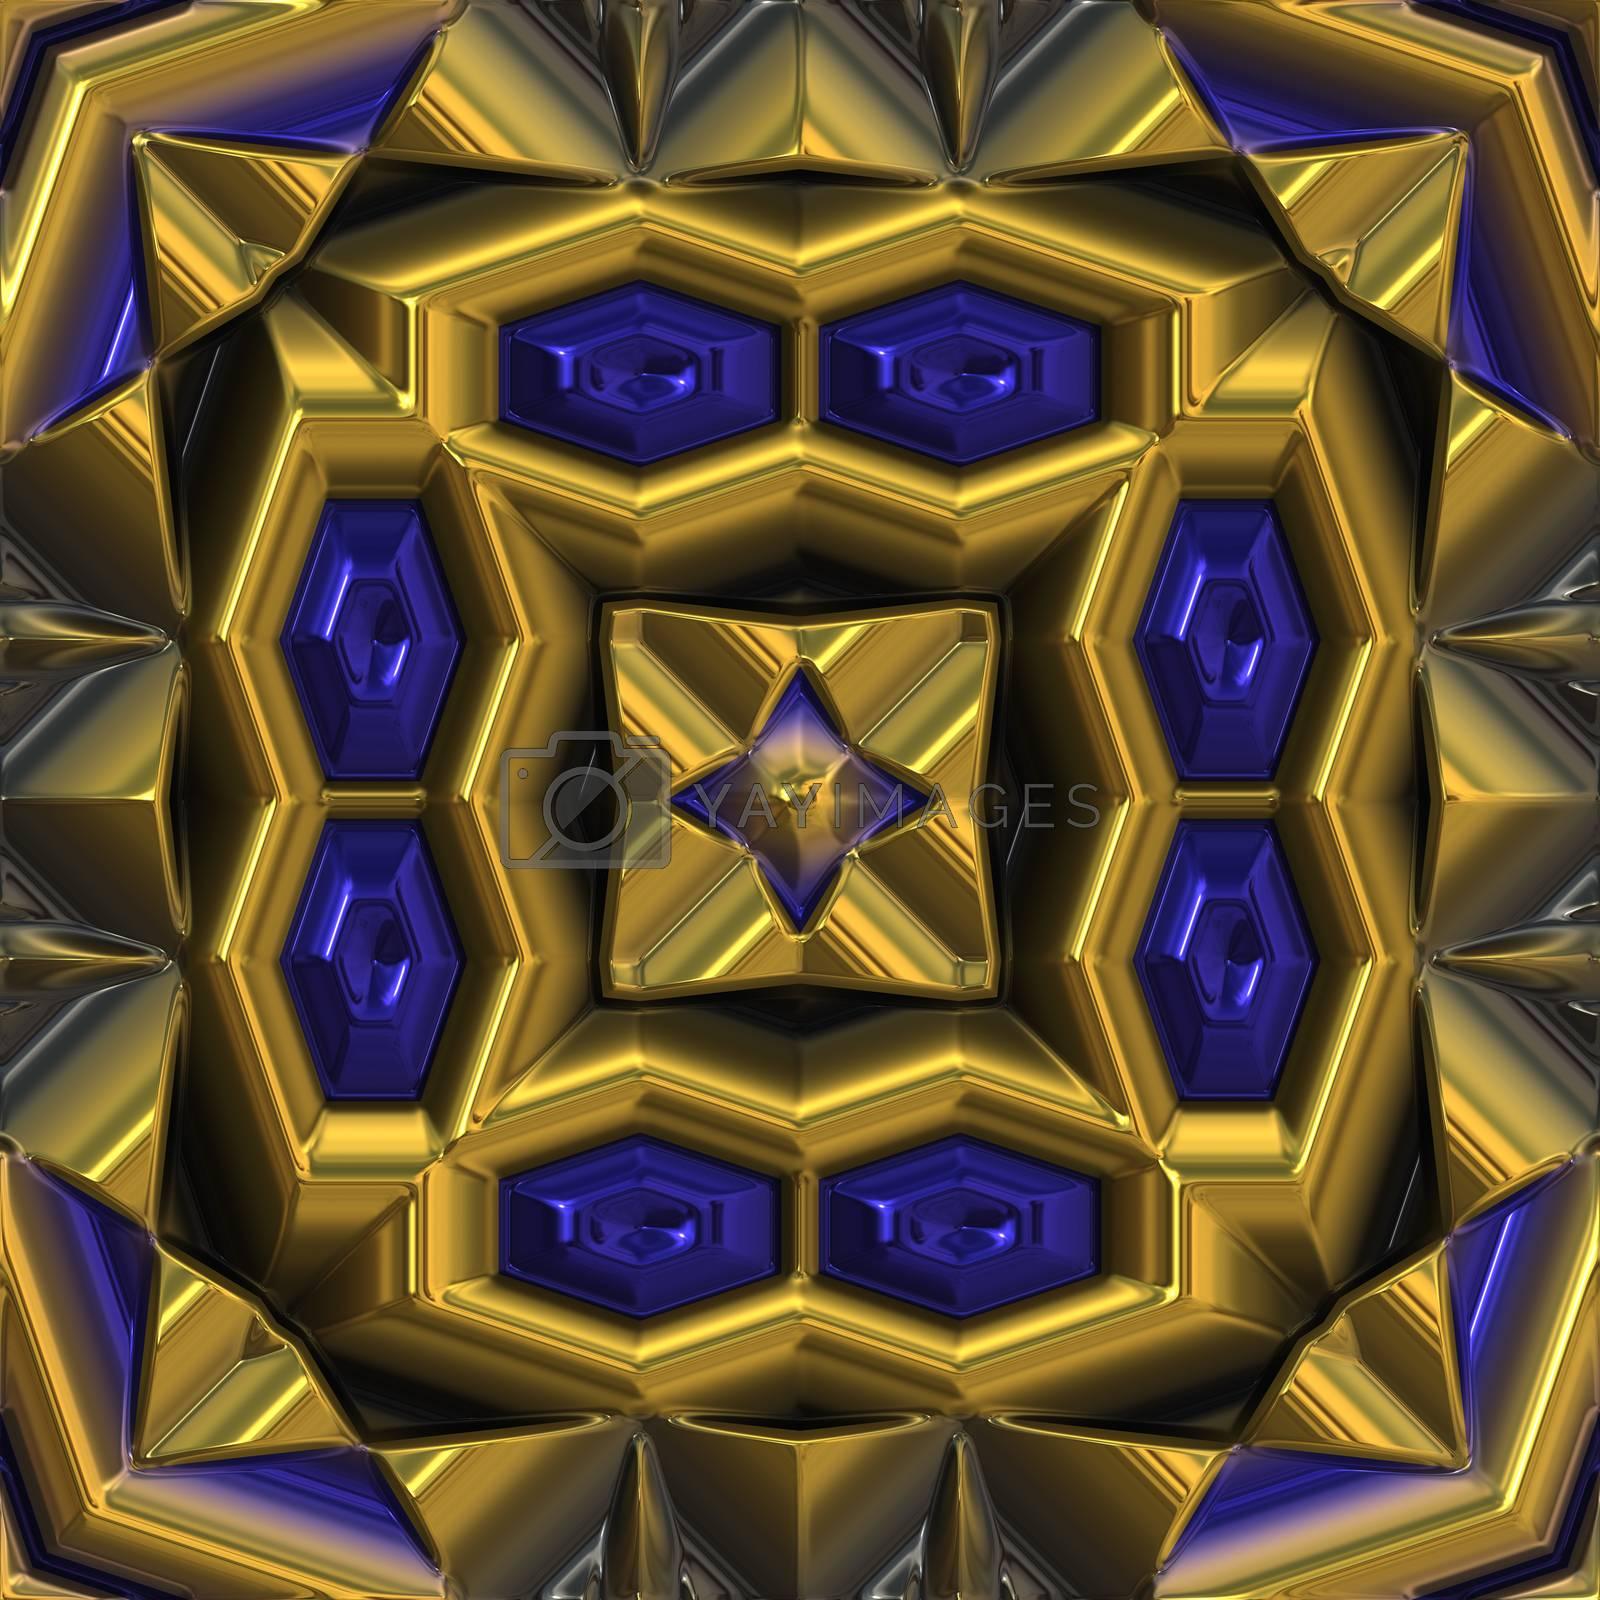 Royalty free image of seamless0129_9 by gallofoto